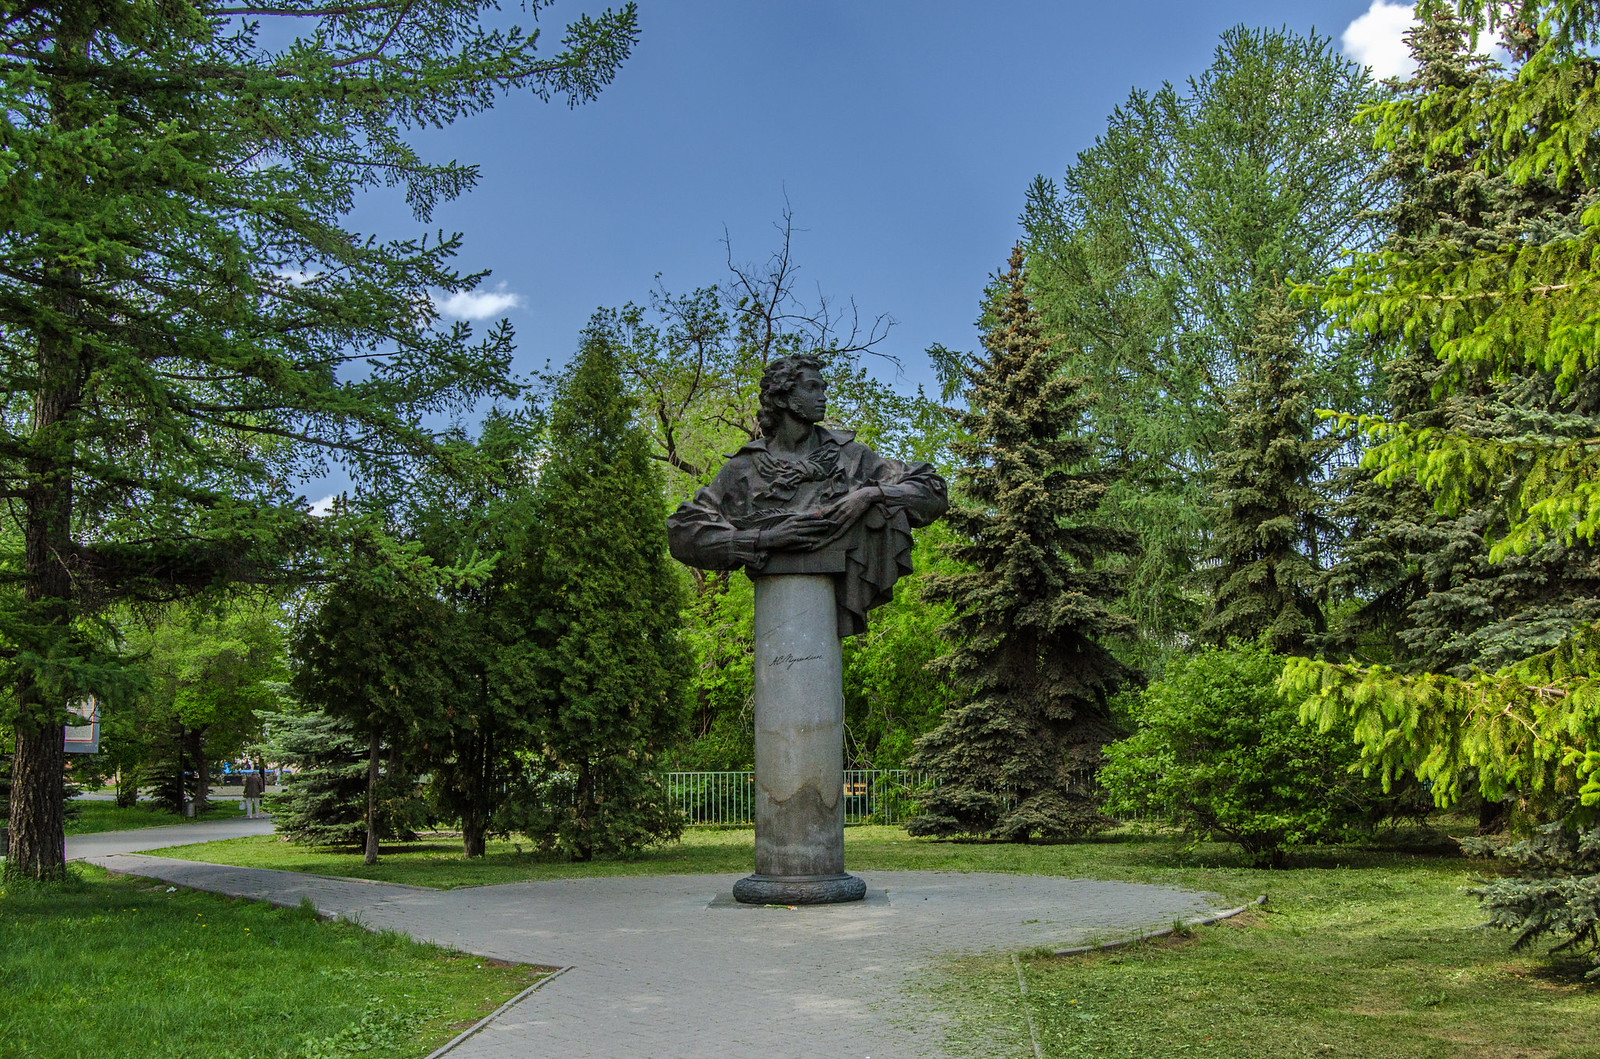 фотограф Челябинск Бюст Пушкин, городской сад имени Пушкина